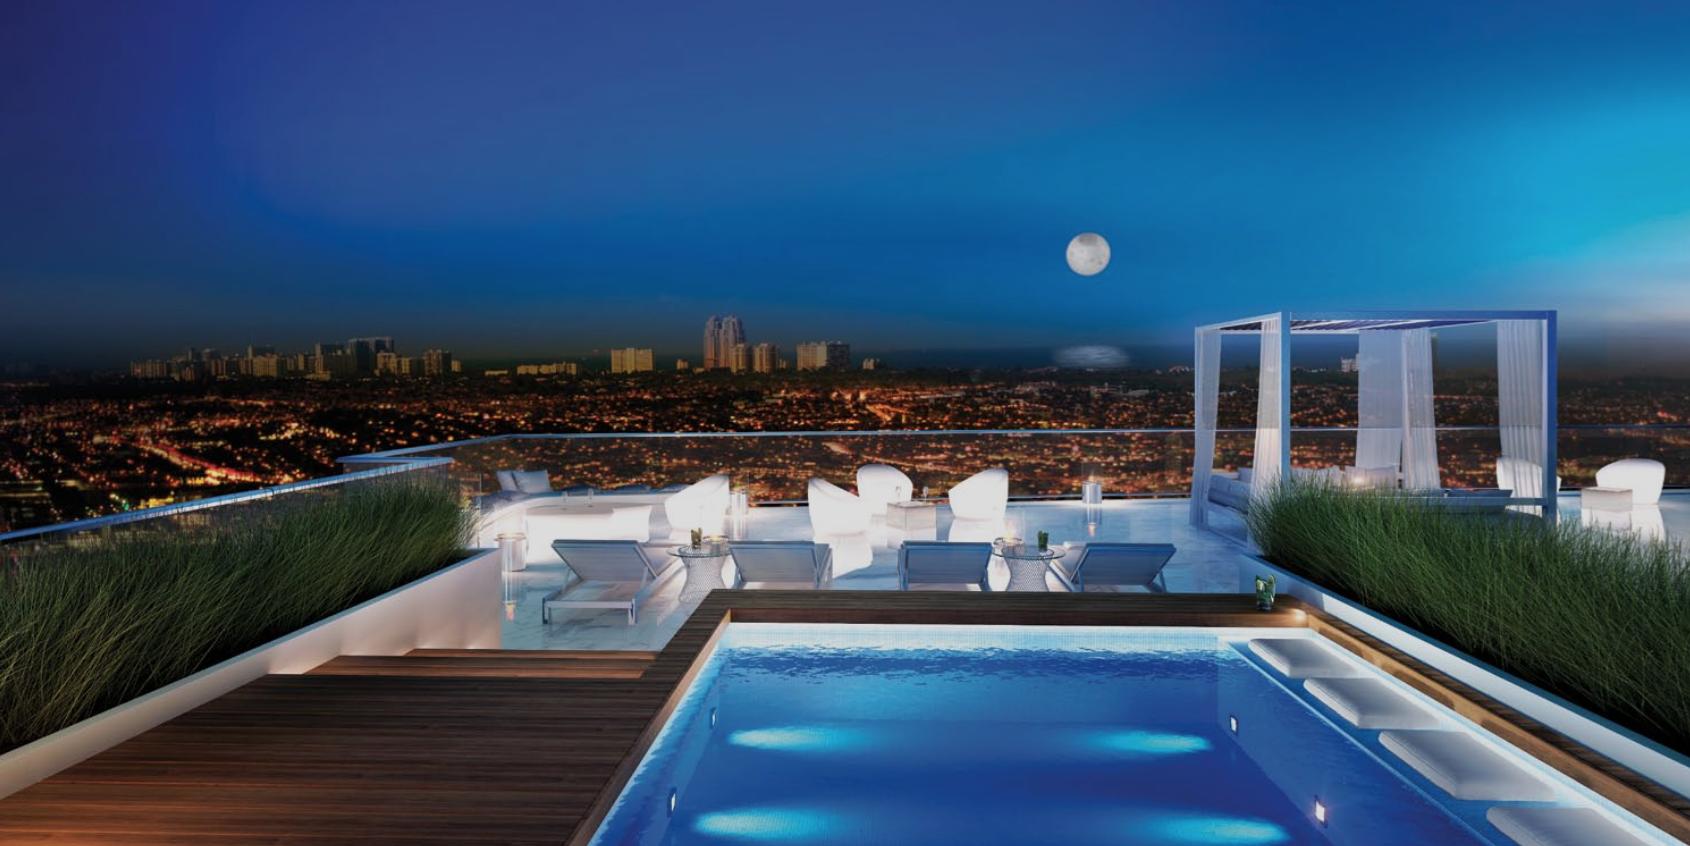 RoofTop Pool.png